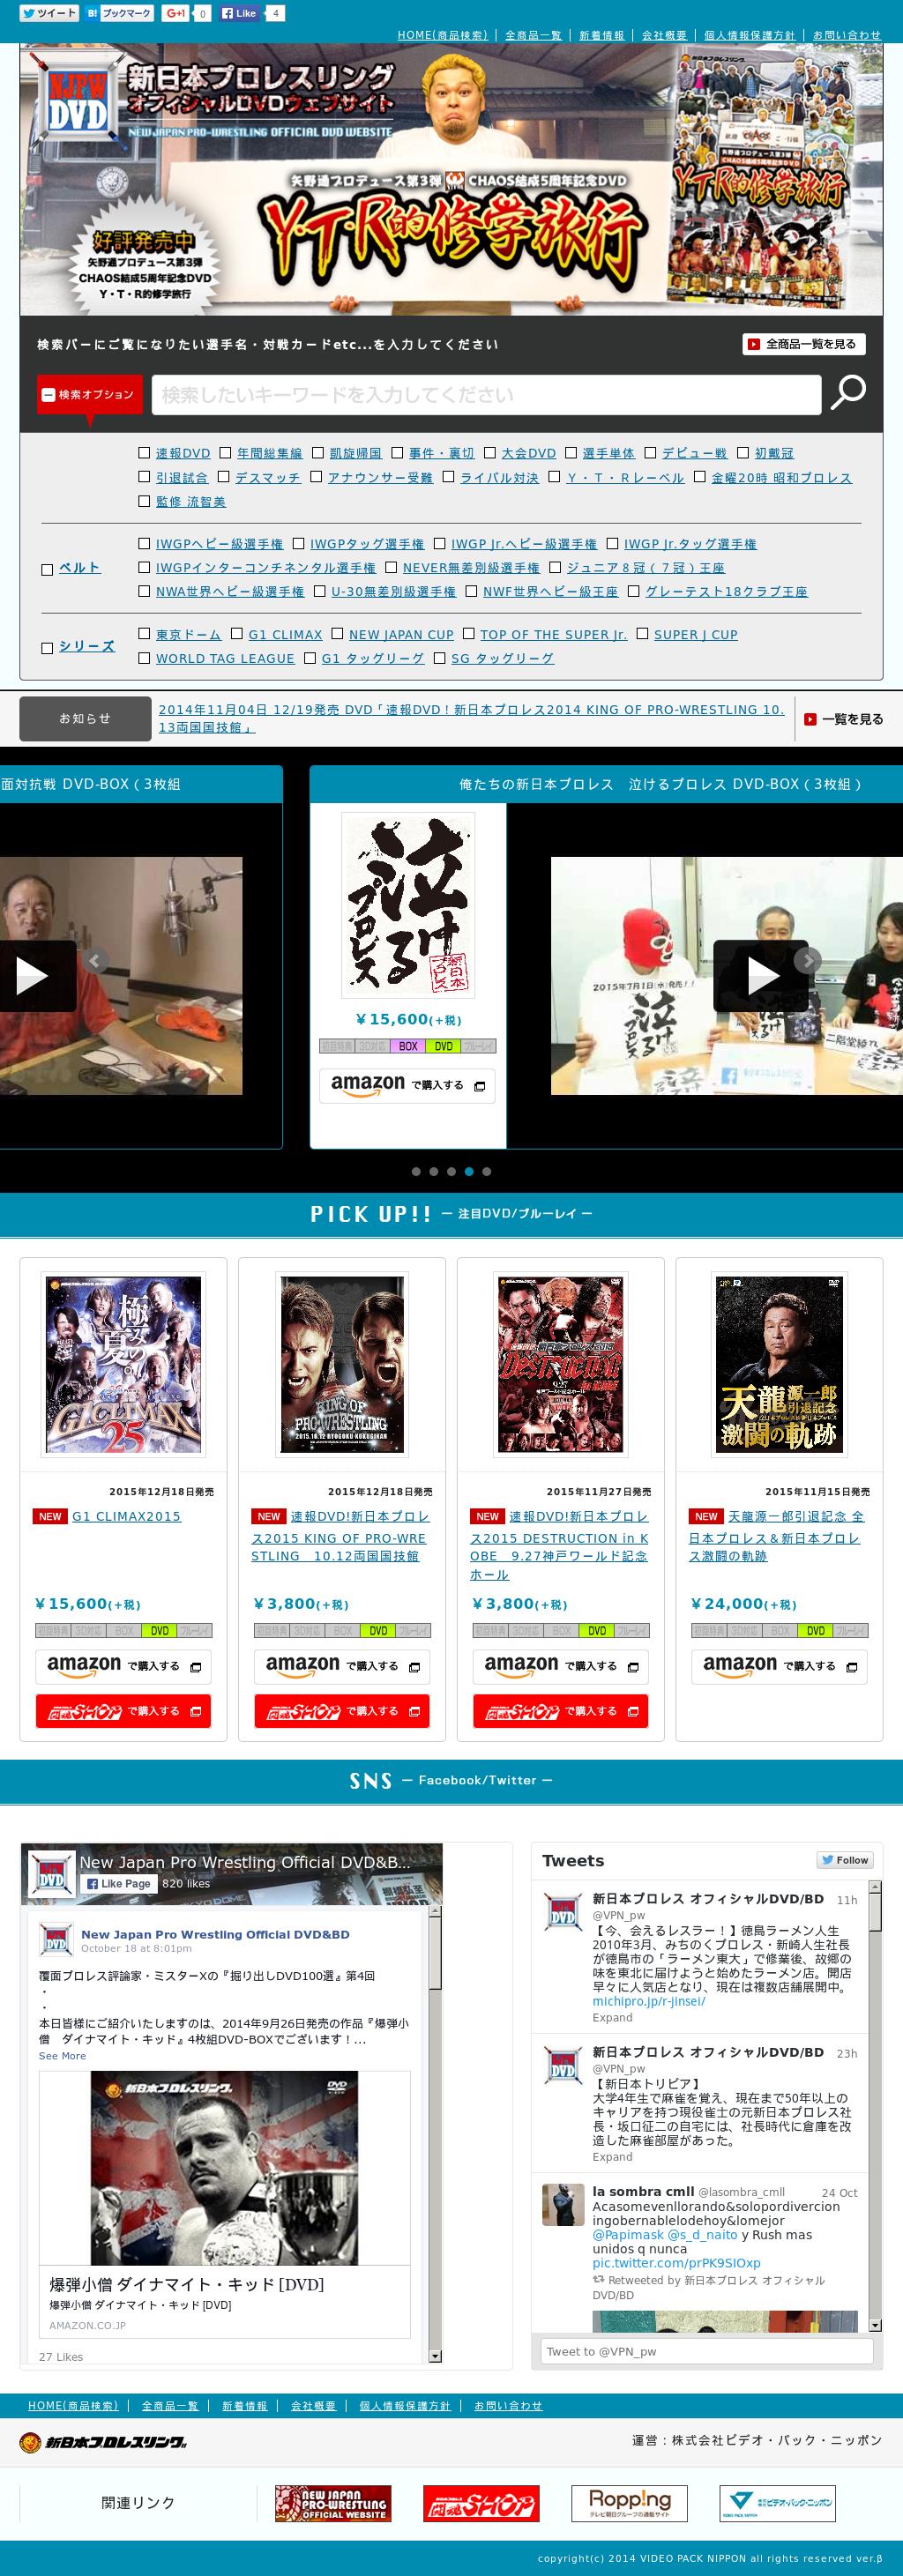 New Japan Pro Wrestling Official Dvd&bd Competitors, Revenue